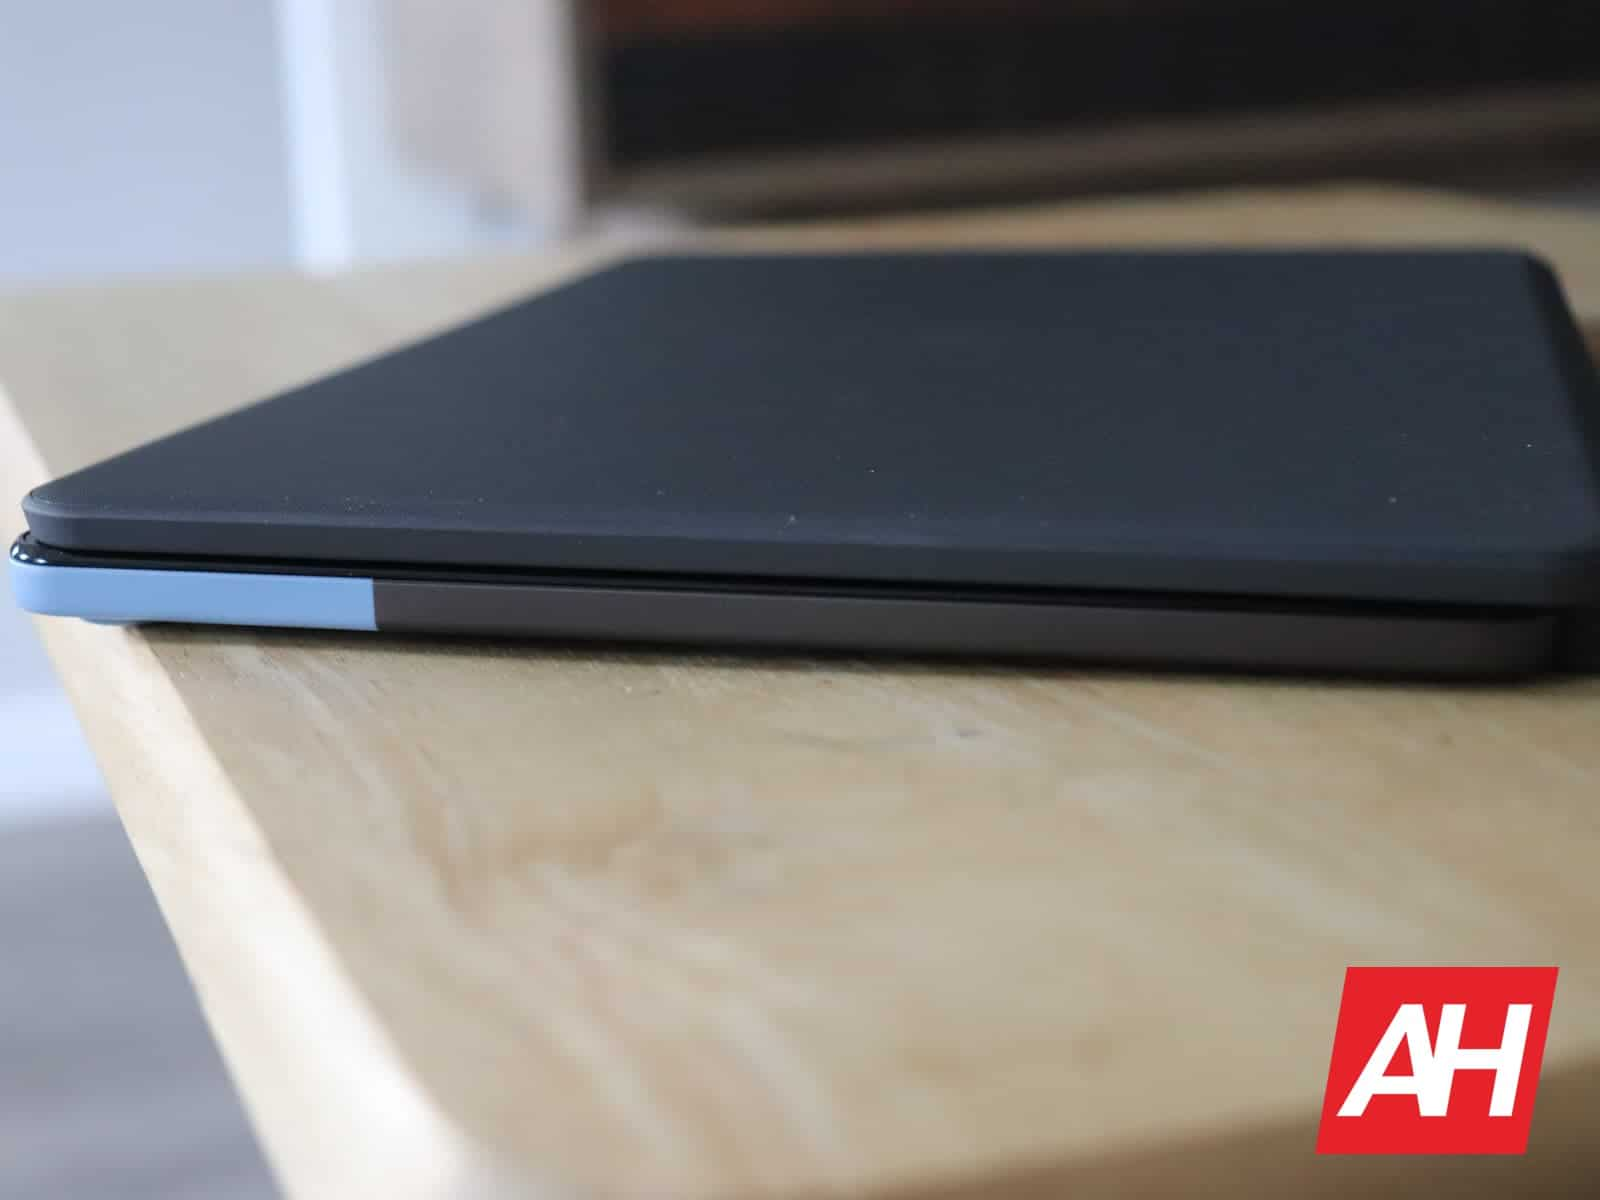 03 3 Lenovo IdeaPad Duet Hardware AH 2020